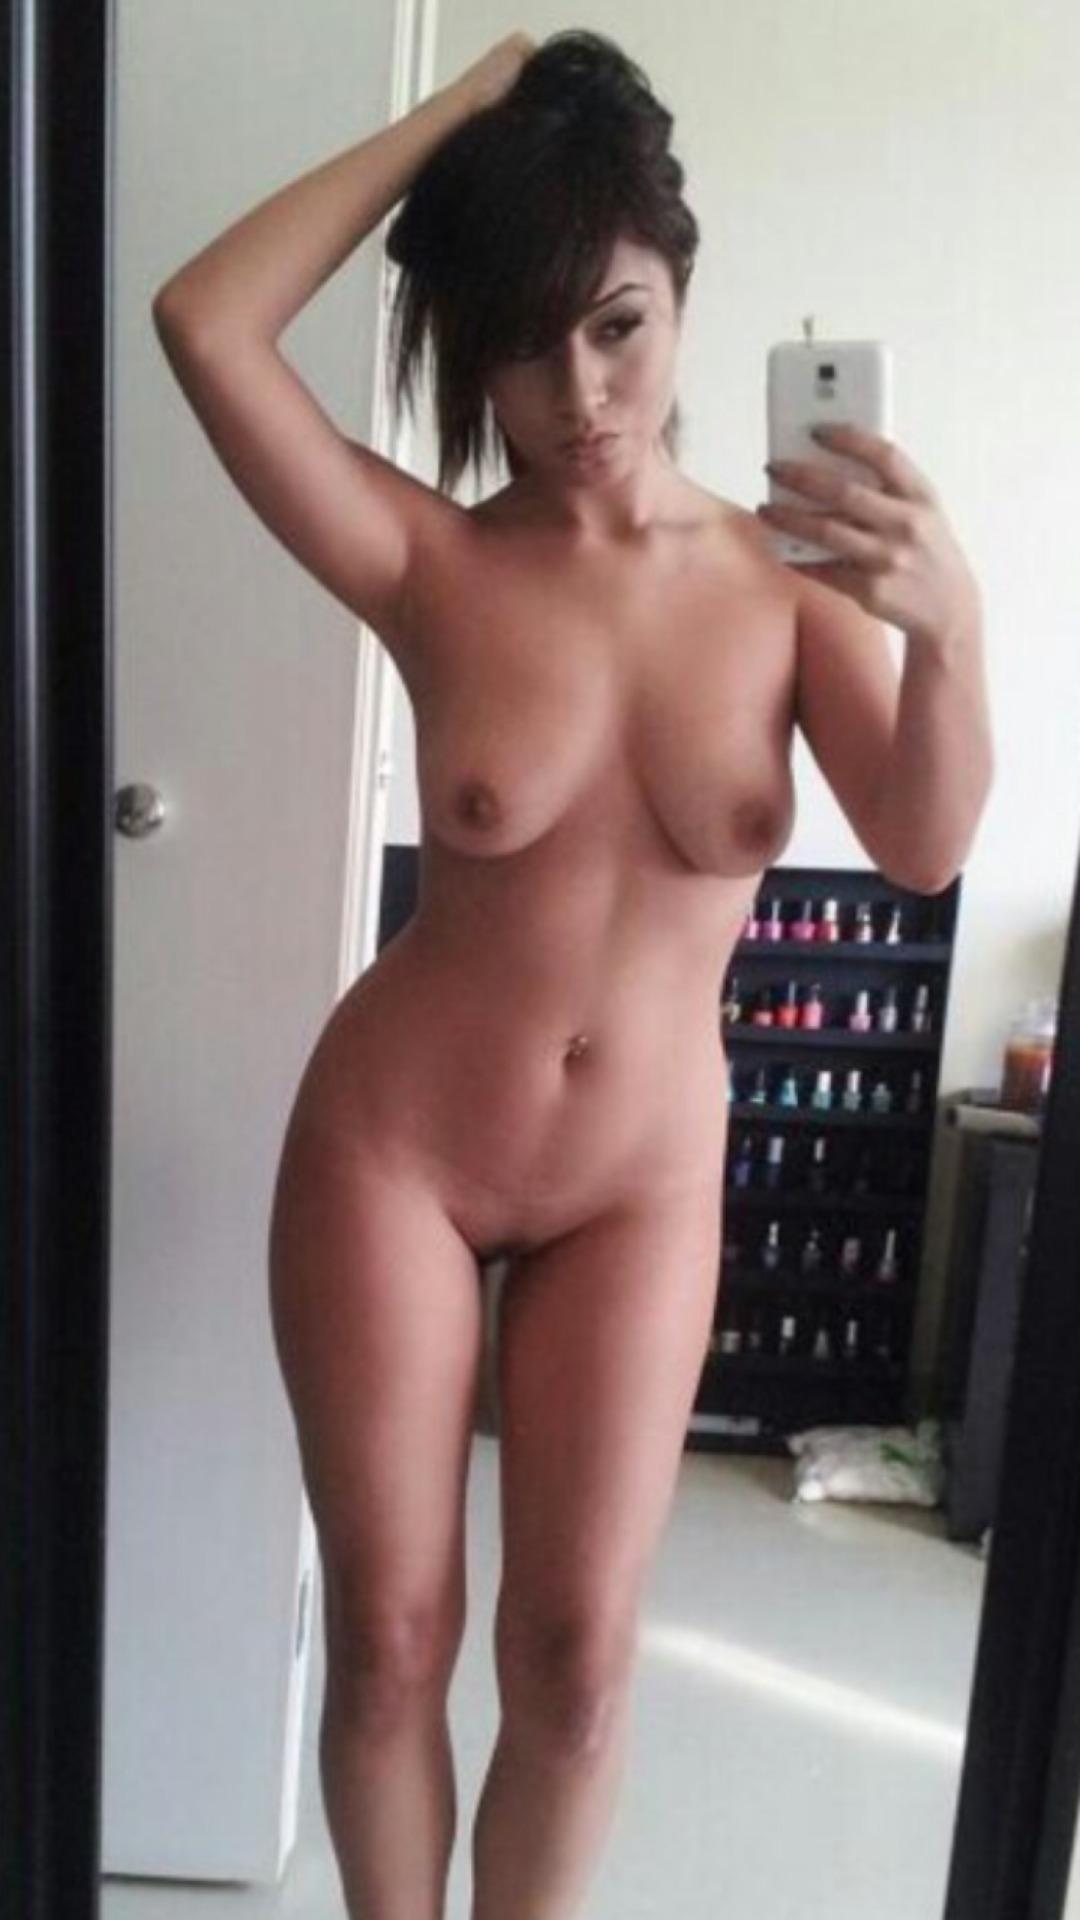 cam sexe dial hot avec fille sexy du 76